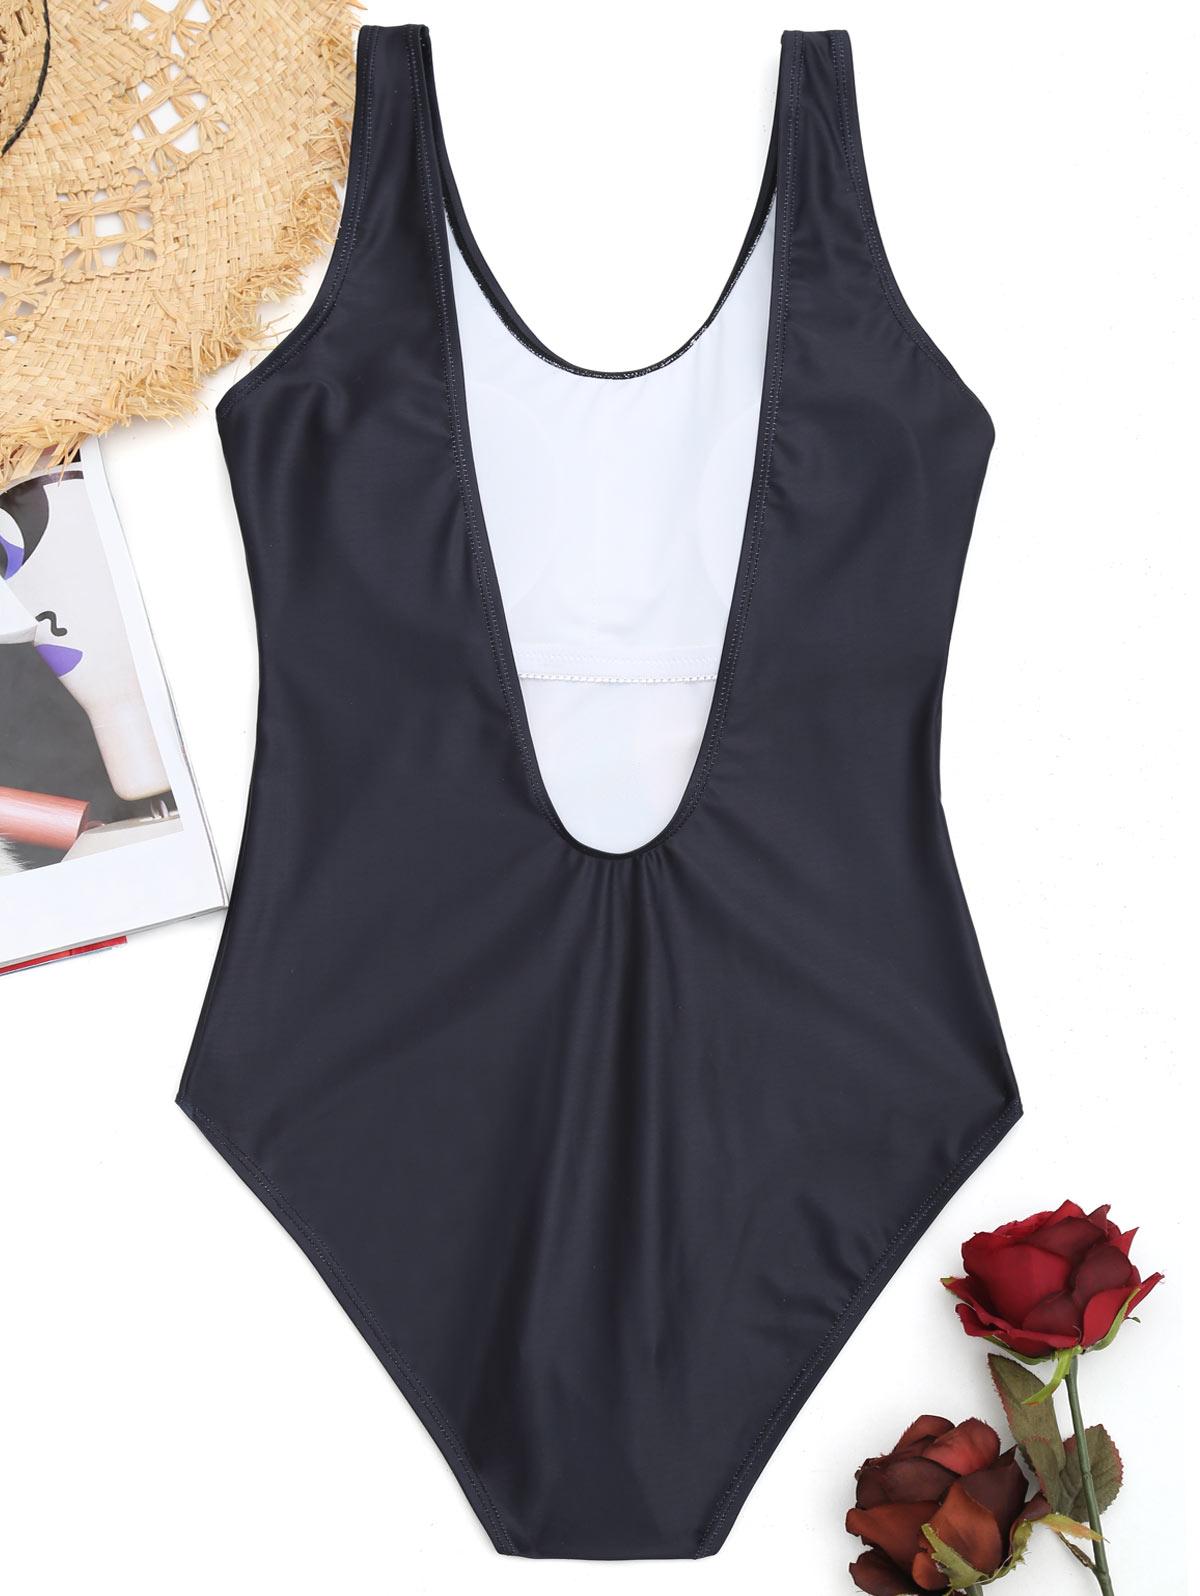 Belleziva Cartoon Flamingo Women Bathing Suit Beach Swimwear Sexy Bodysuit One Piece Swimsuit Biniki Wireless Padded Animals 1